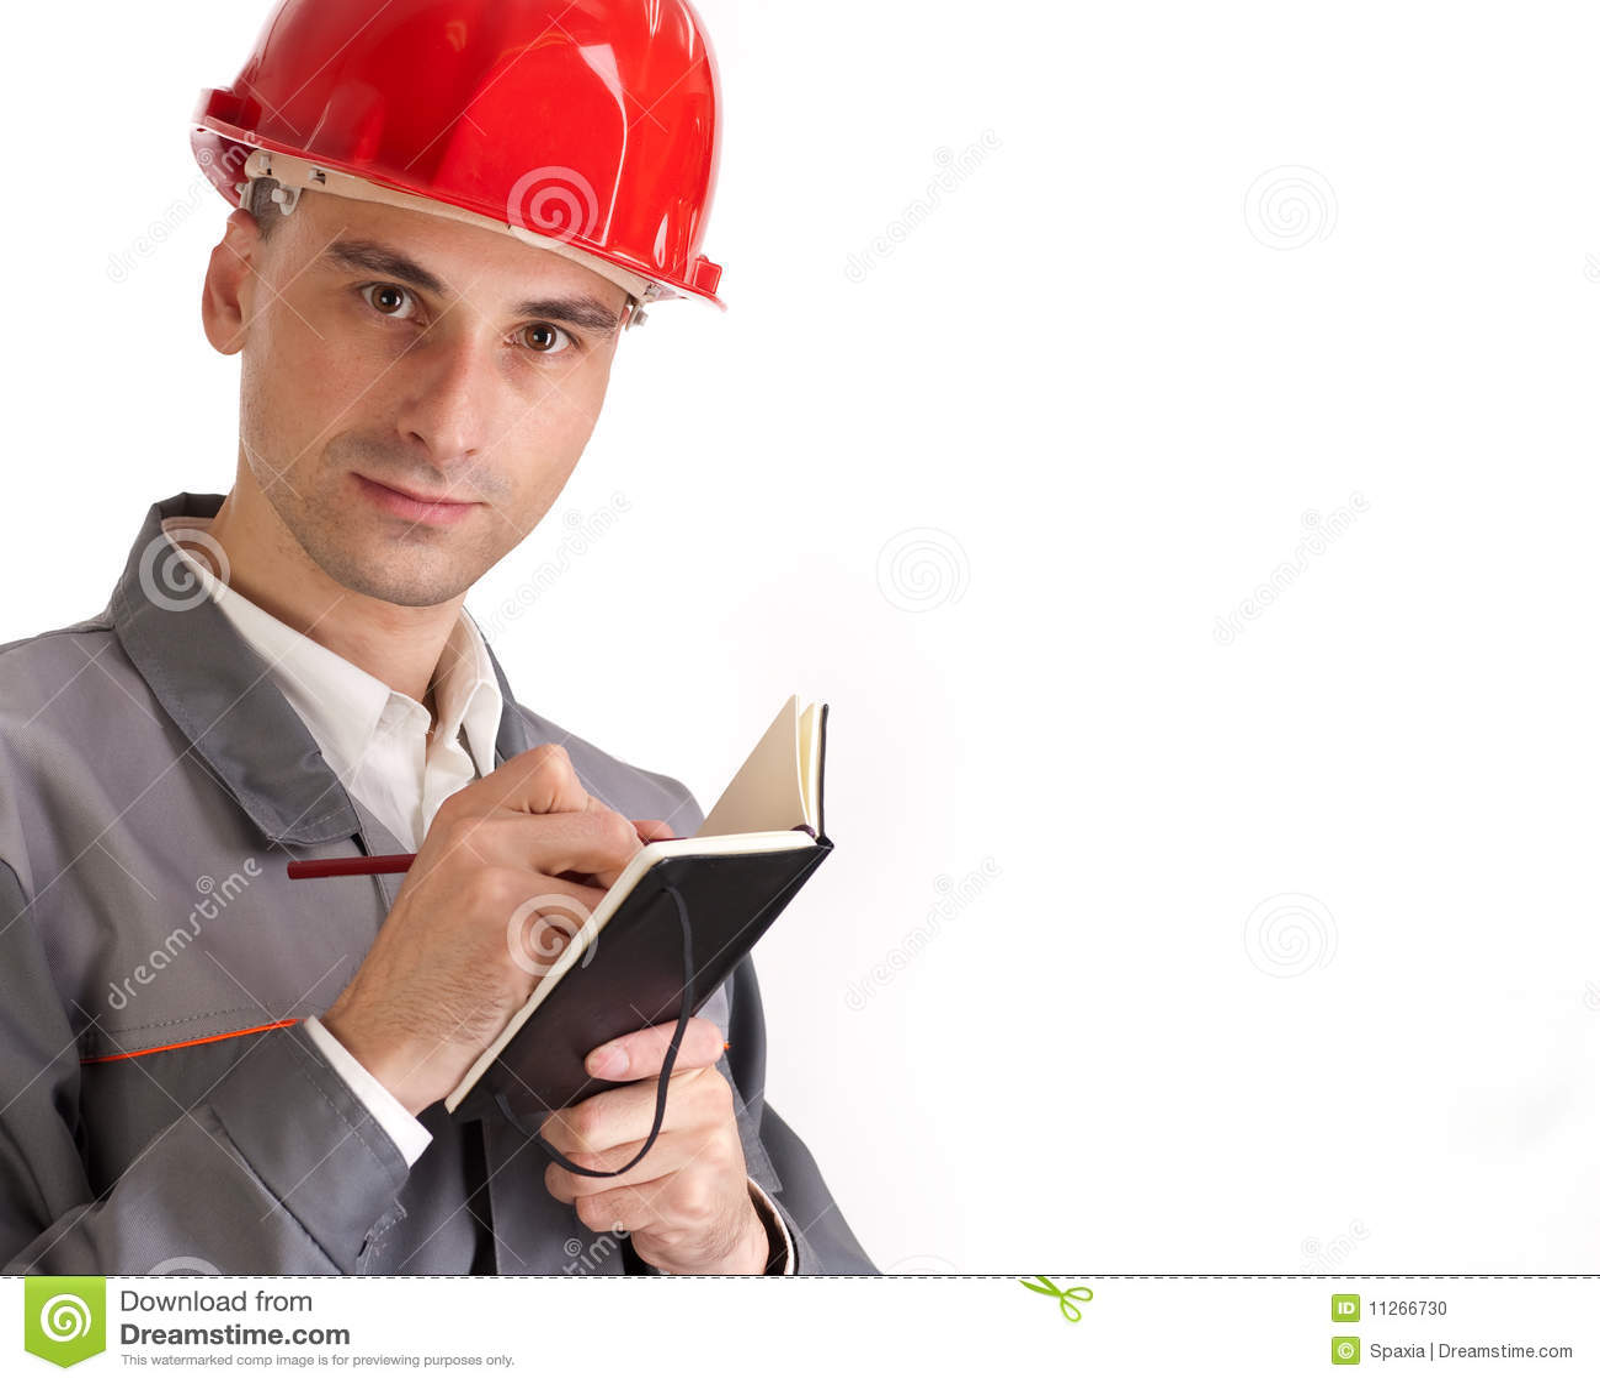 Construction Site: Construction Site Manager